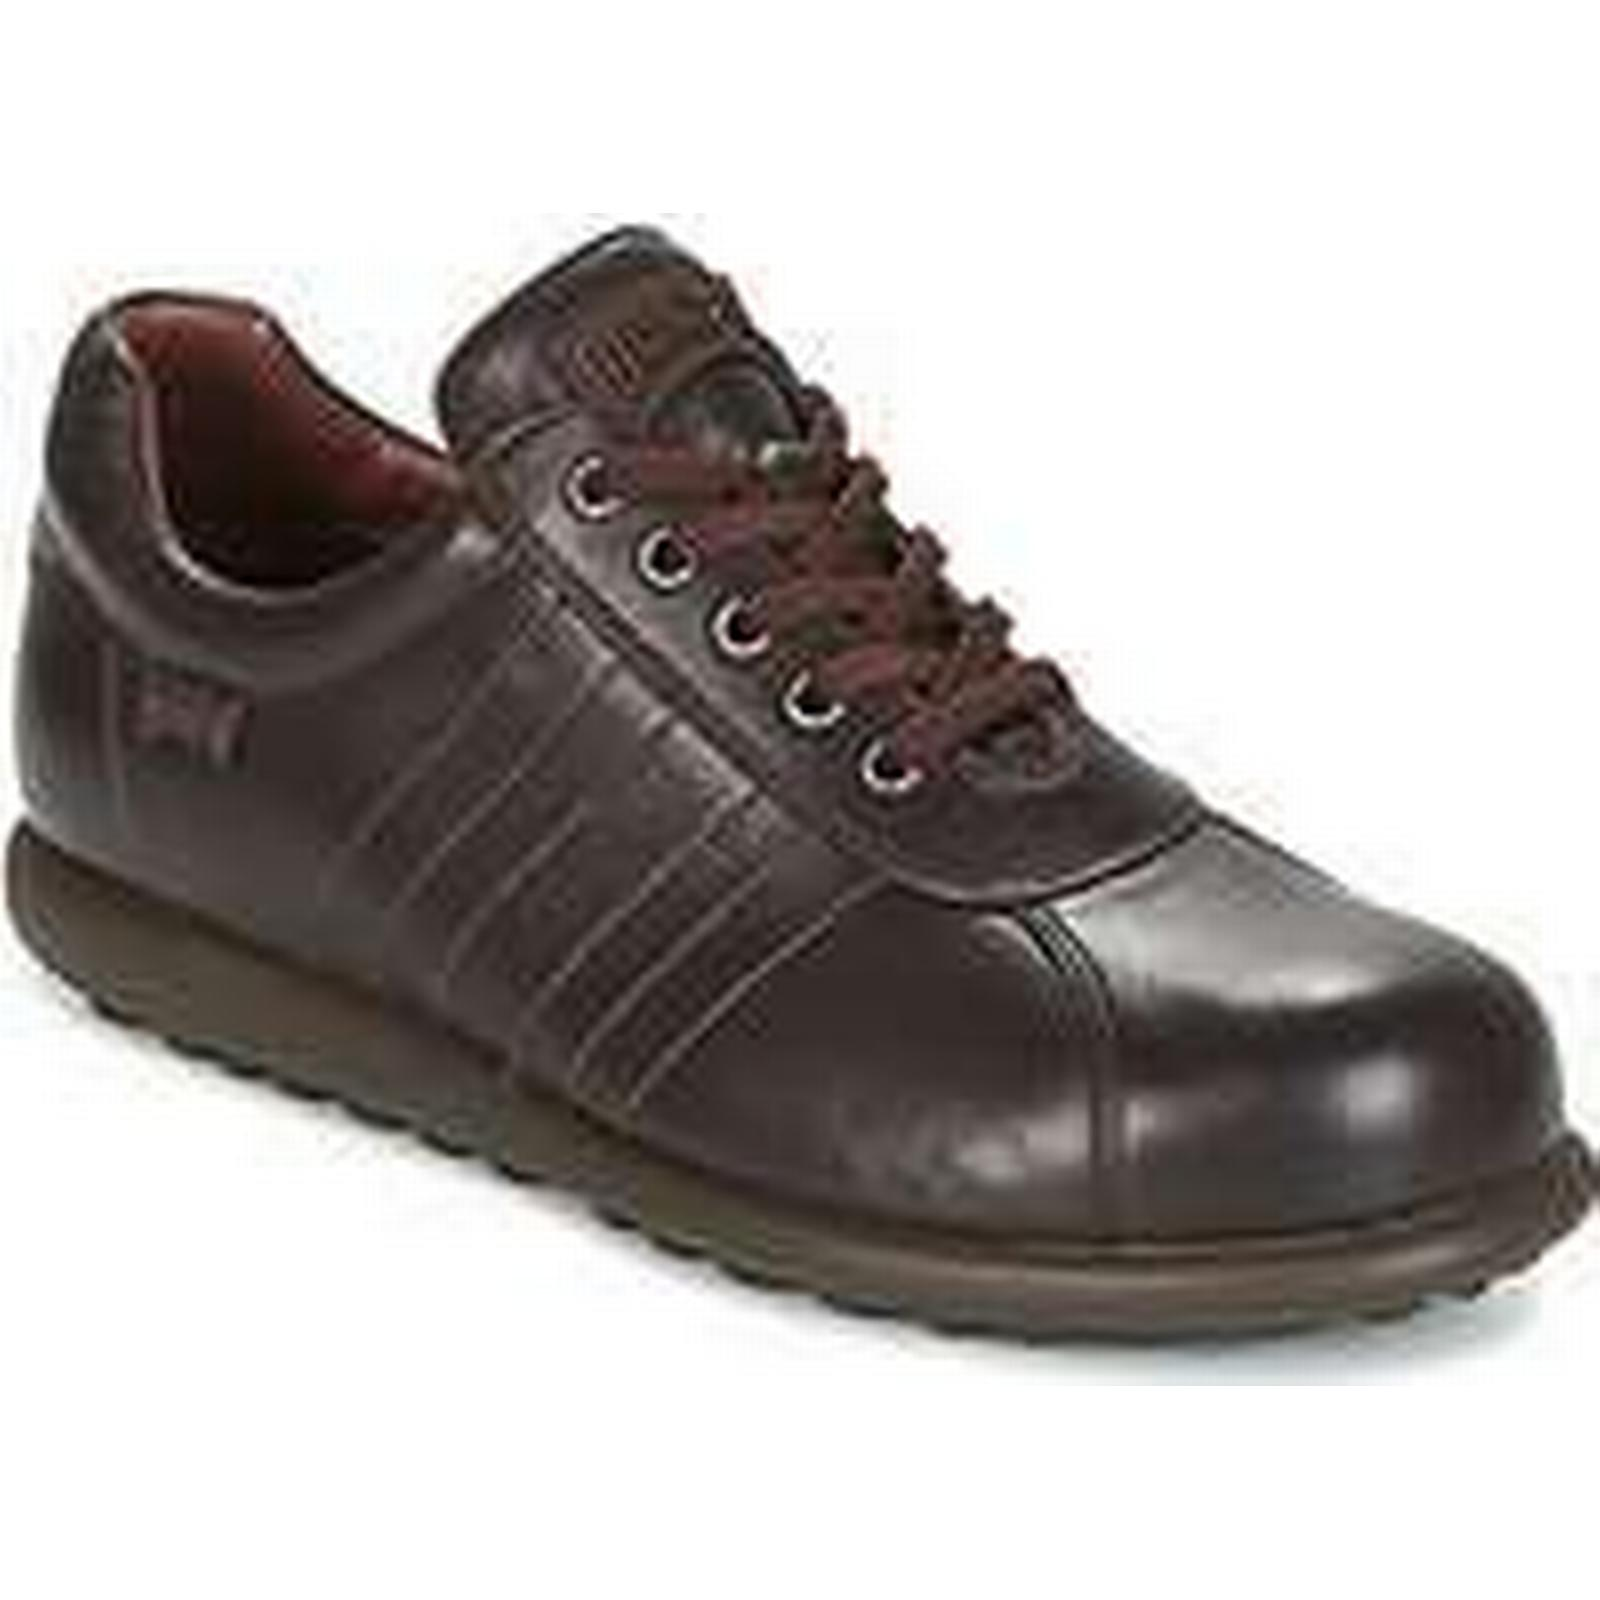 Spartoo.co.uk Casual Camper PELOTAS ARIEL men's Casual Spartoo.co.uk Shoes in Brown 5e9786